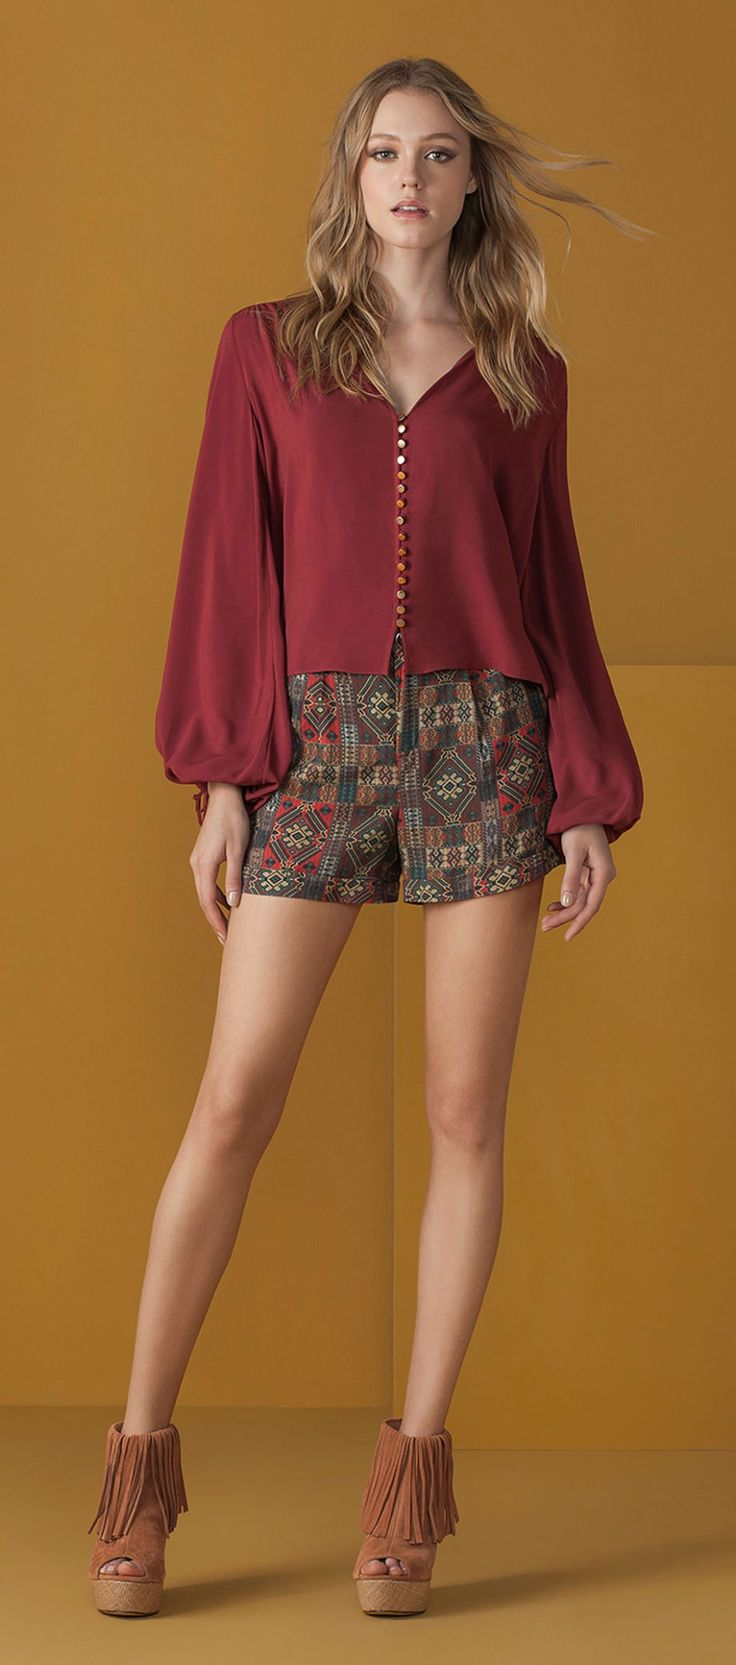 blusa manga comprida mangas bufantes com botoes shorts estampado etnico open boot franjas anabela plataforma